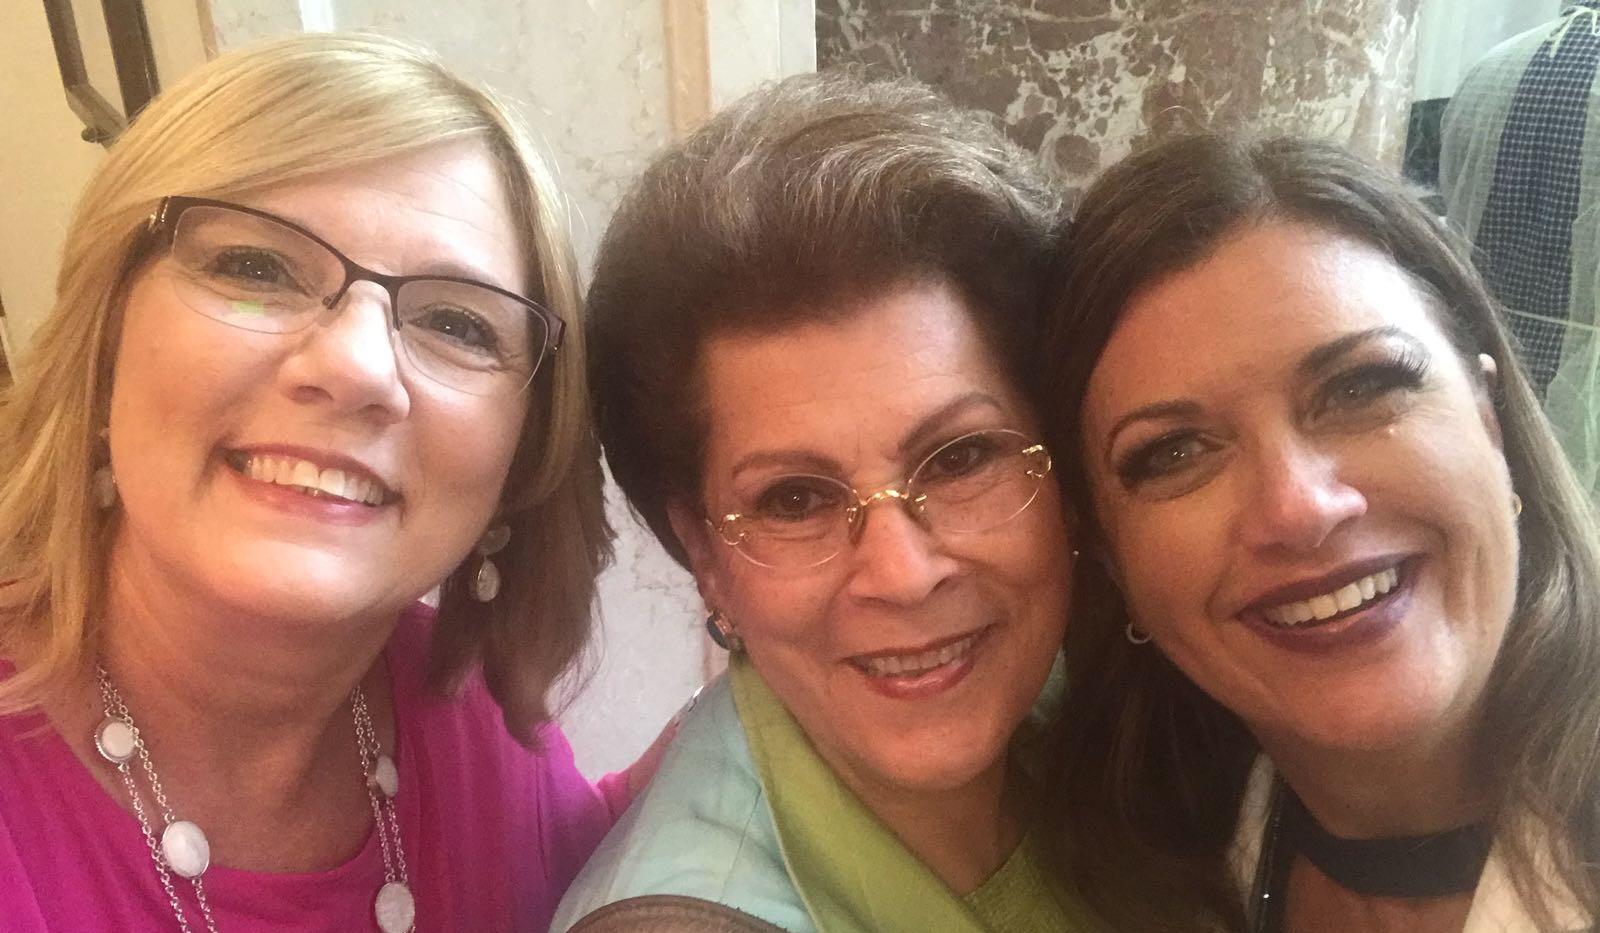 Lilly, Dra Novello & Dra Elba Diaz.jpg